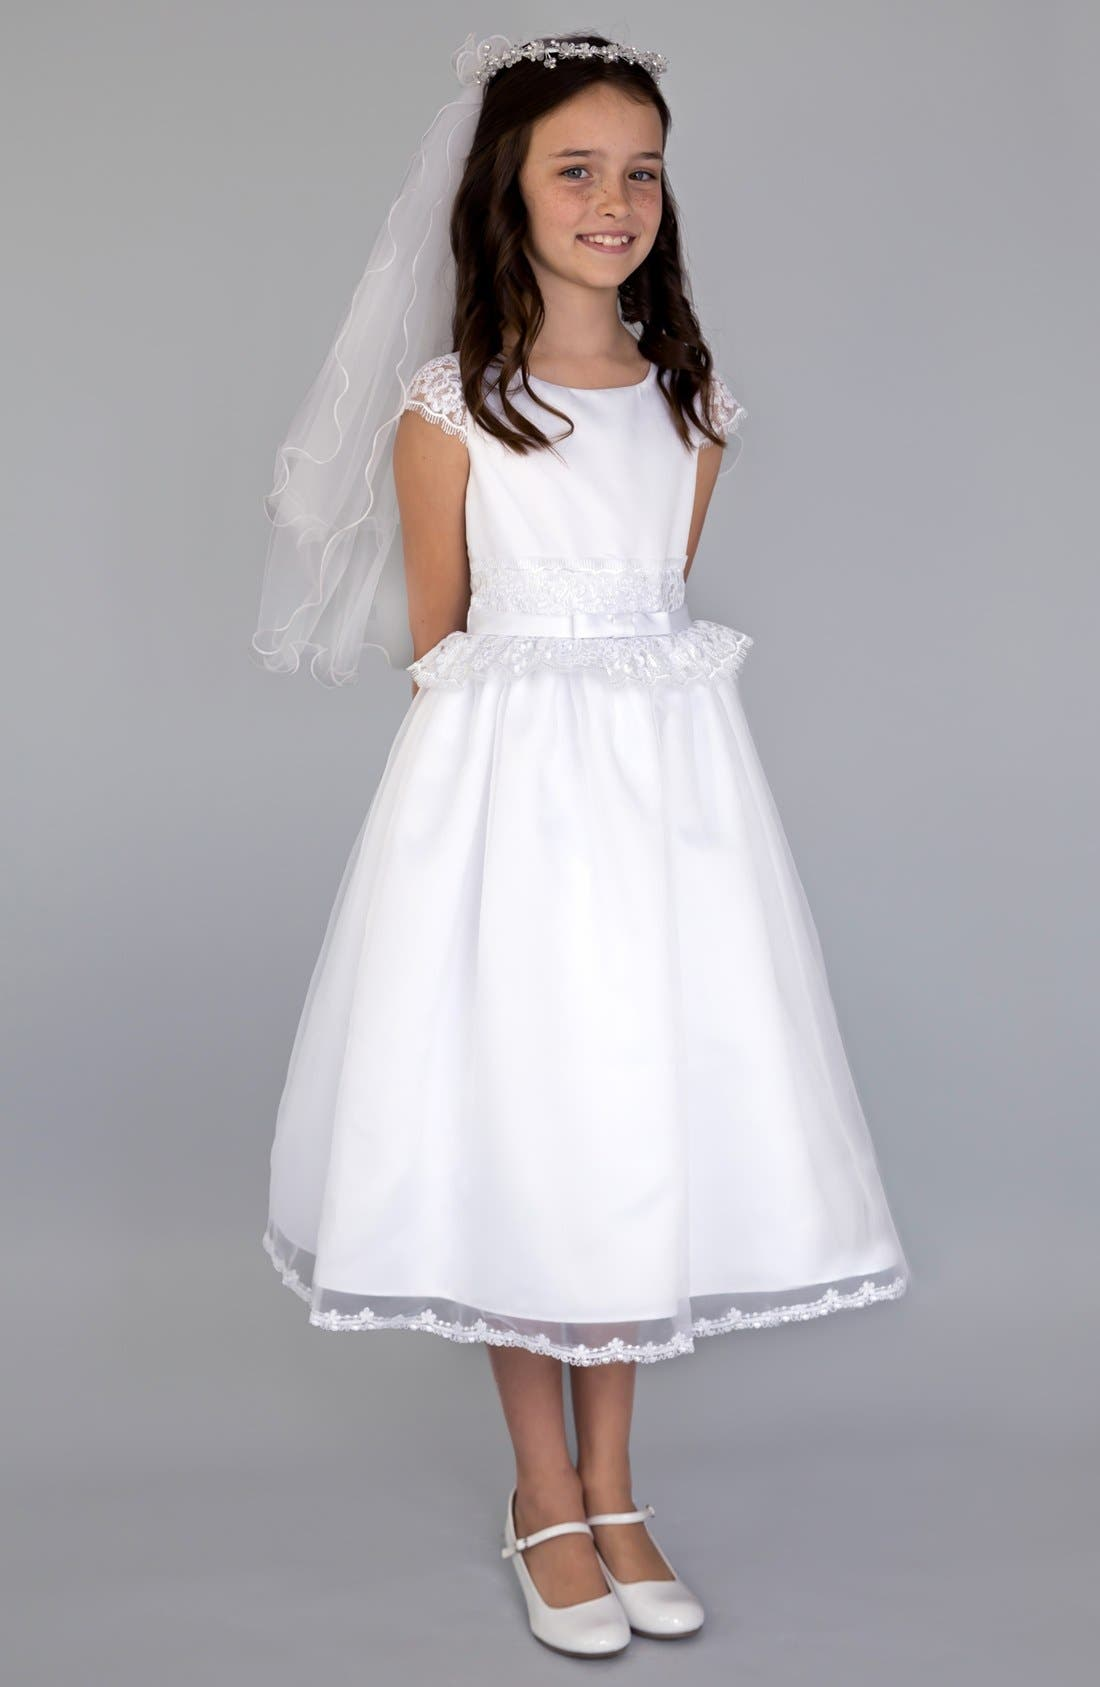 Lace Peplum Organza Dress,                         Main,                         color, White